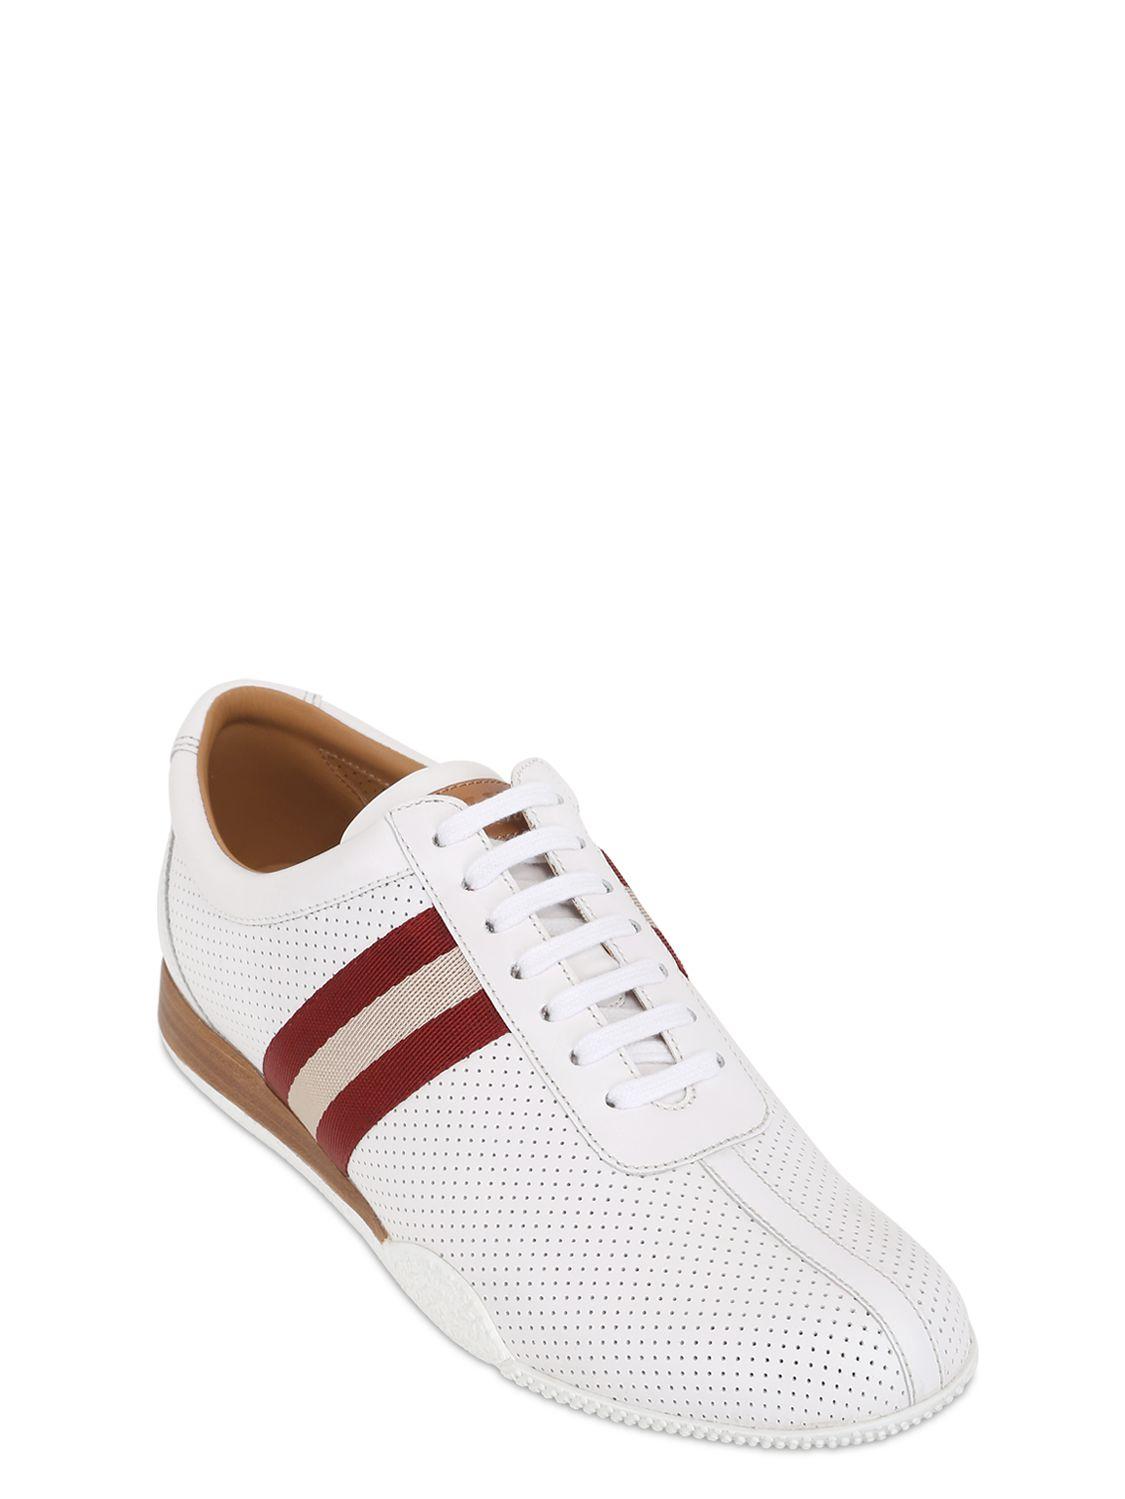 White Bally Shoes